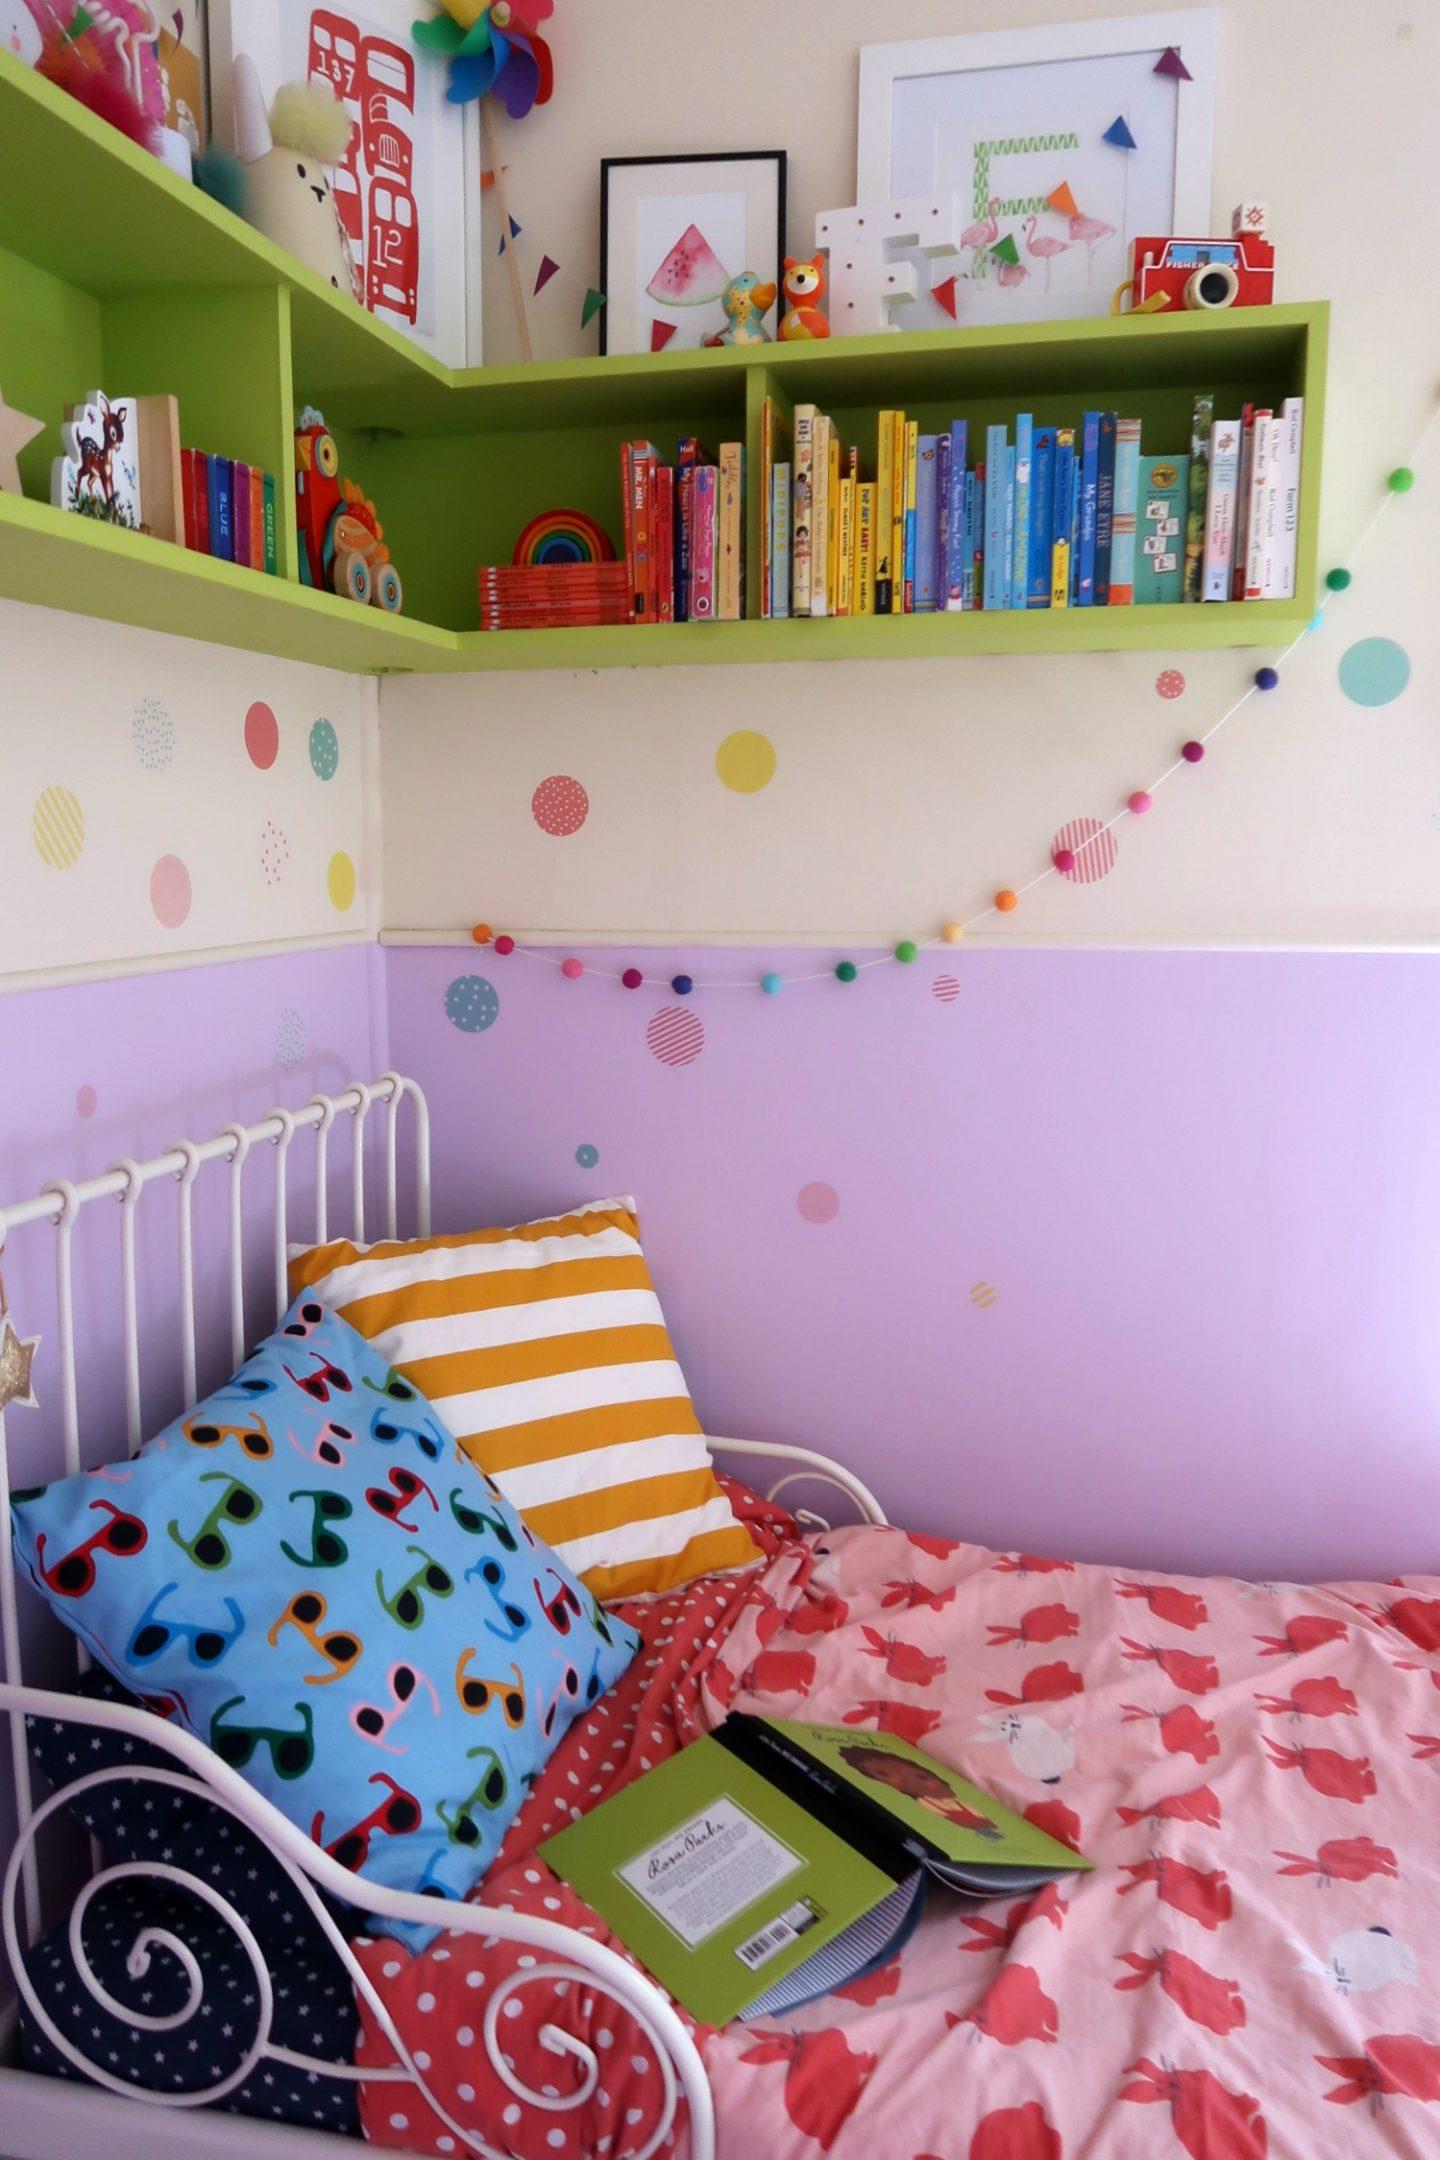 IKEA Minnen bed and IKEA cushions - IKEA school run hacks